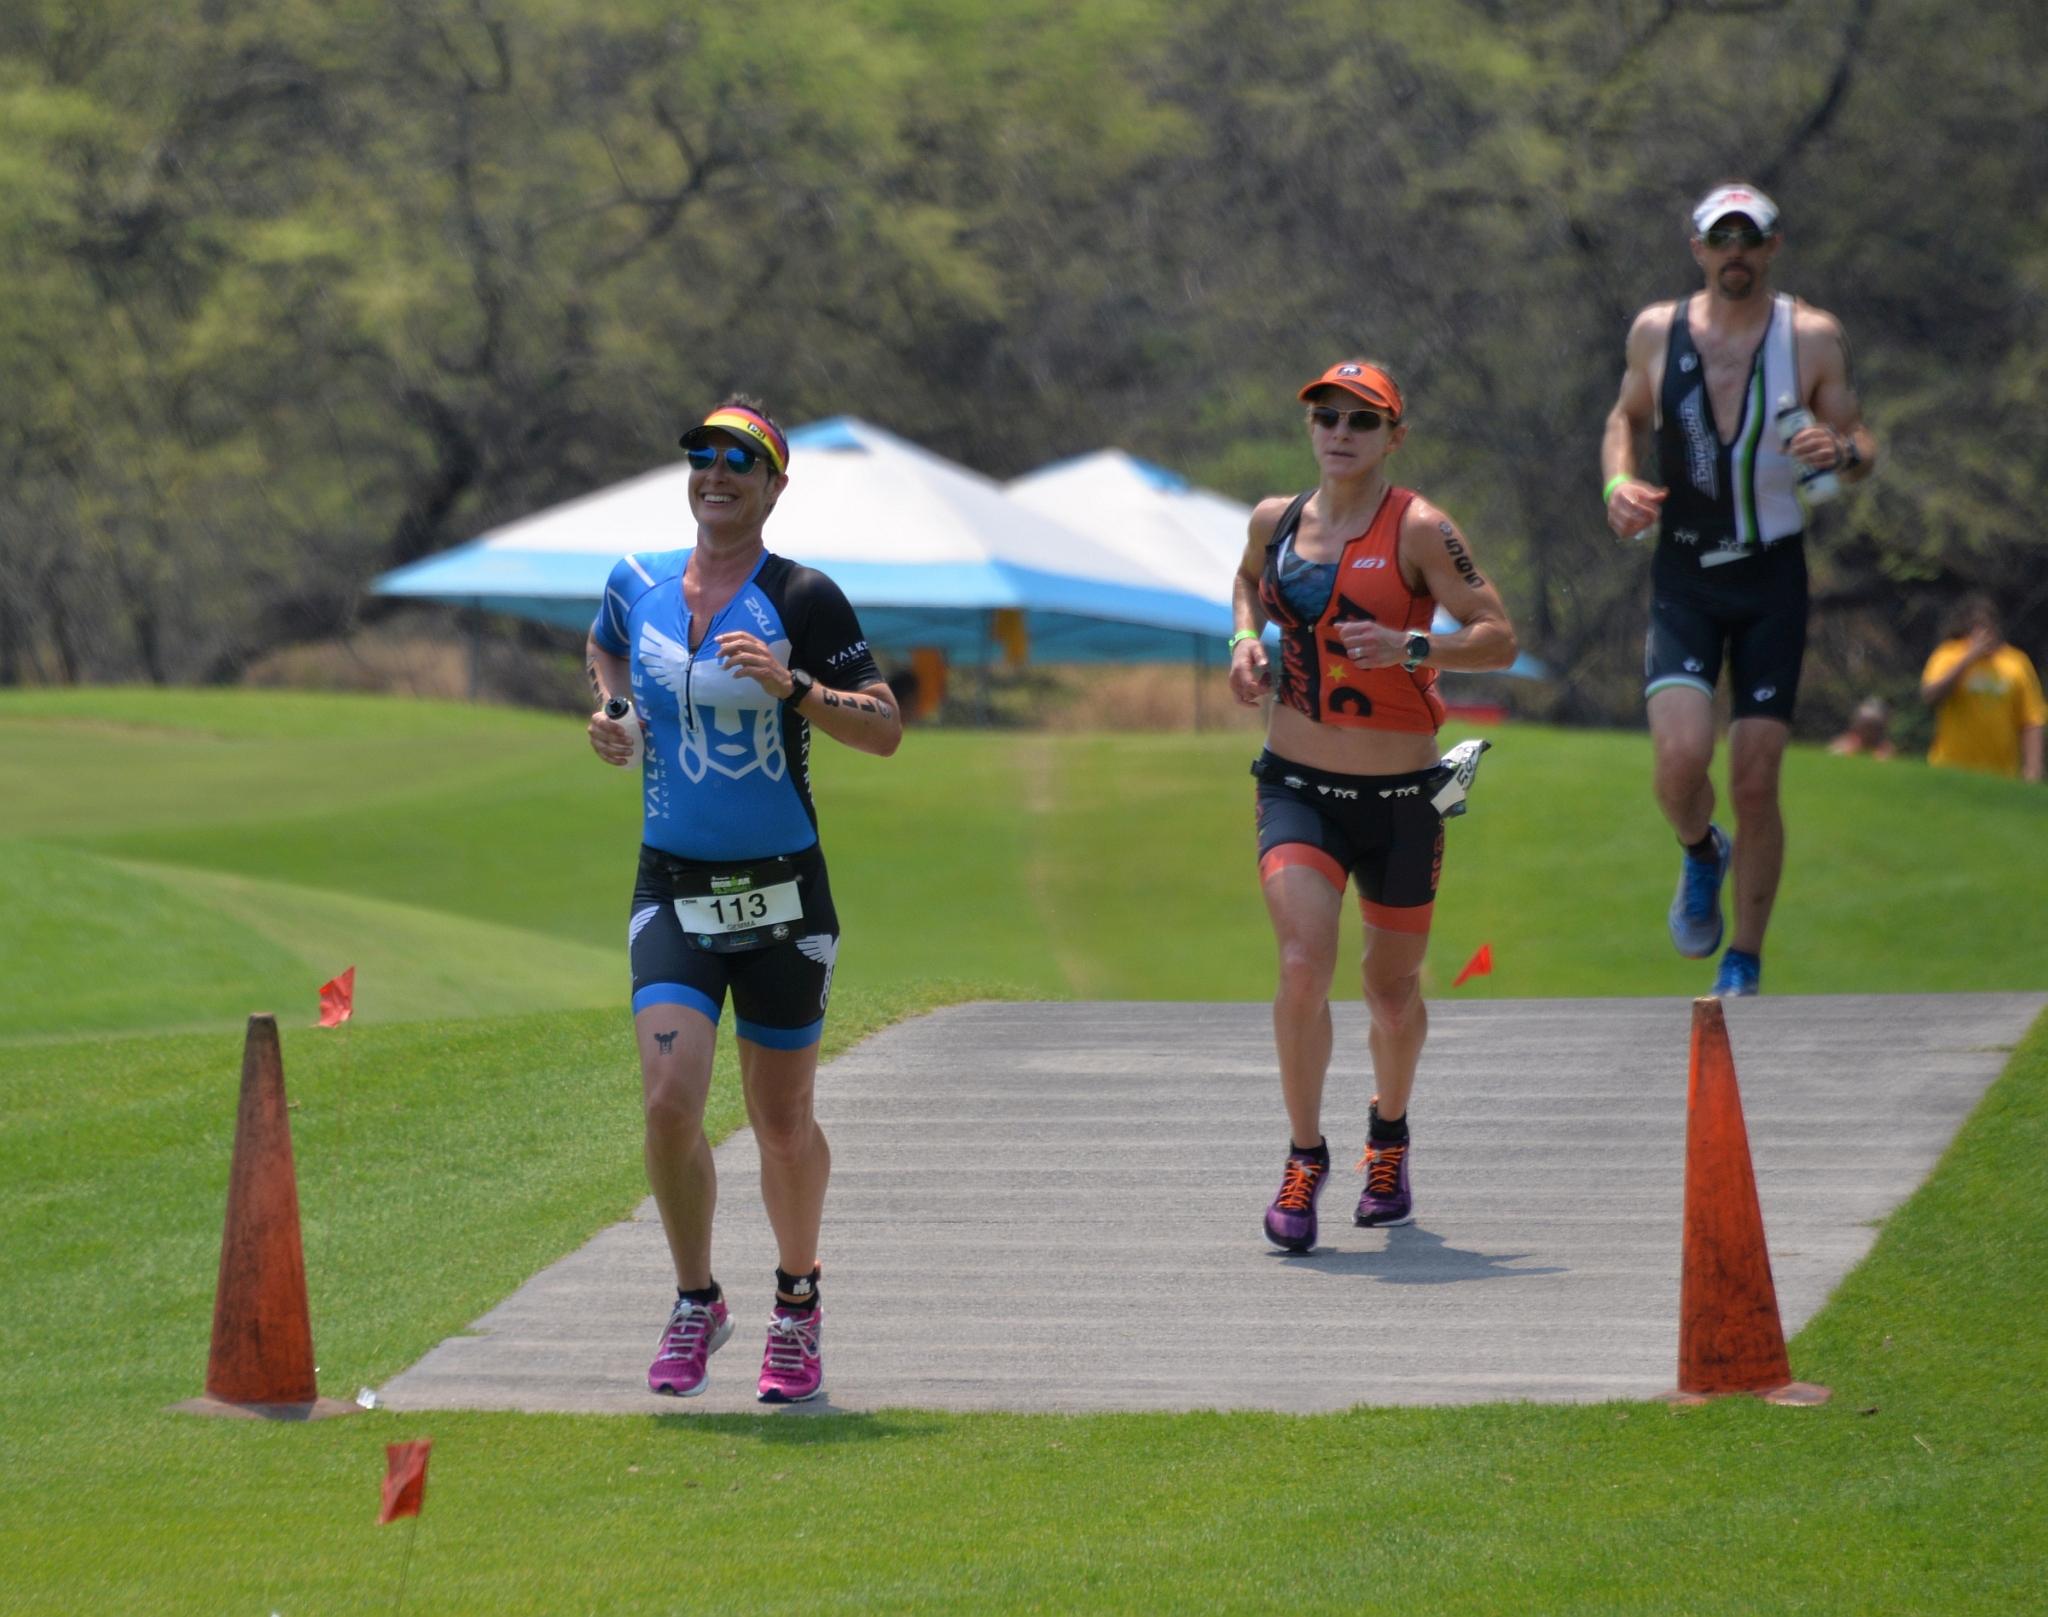 Coach_Terry_Wilson_Gemma_Hollis_Ironman_Hawaii_70.3_Push_Glide_Kick_E3TS_E3_Training_Solutions_7.JPG